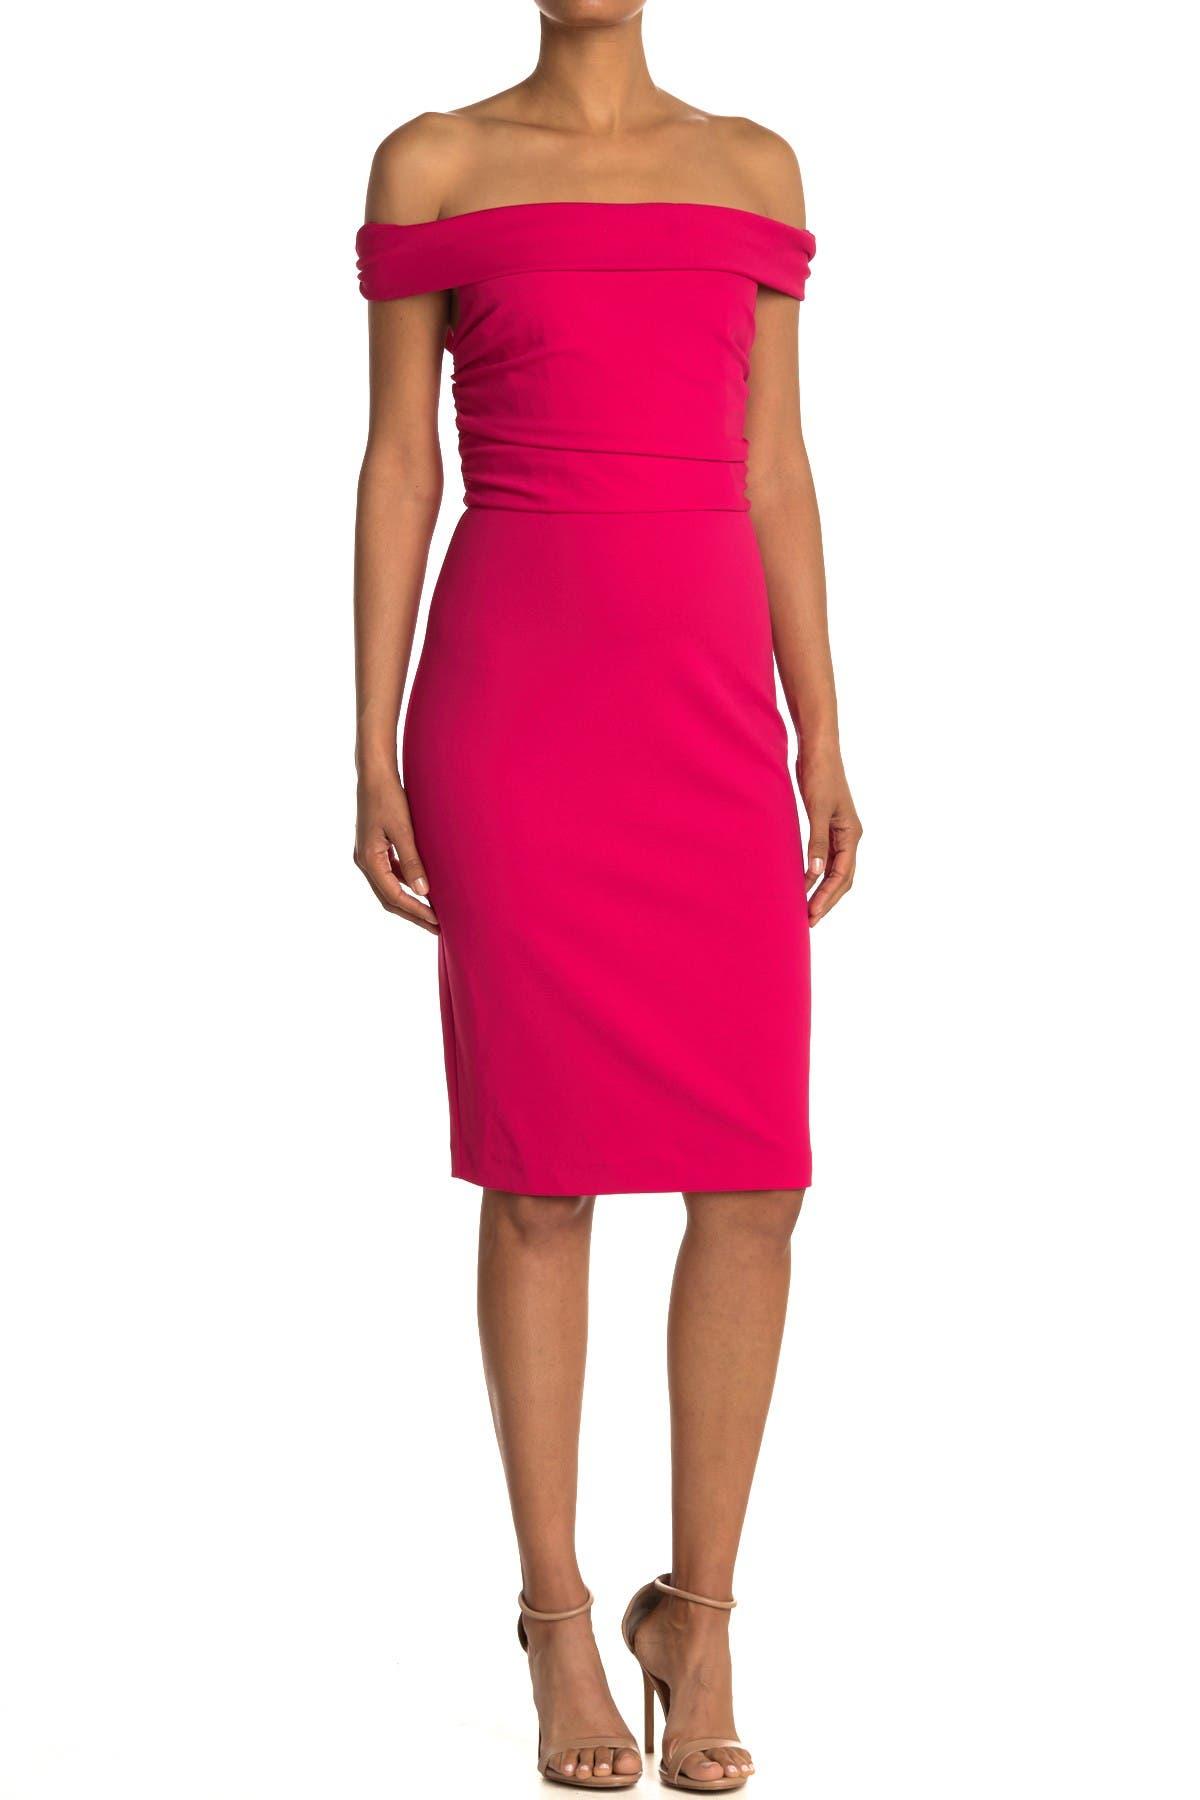 Image of trina Trina Turk Picture Perfect Dress